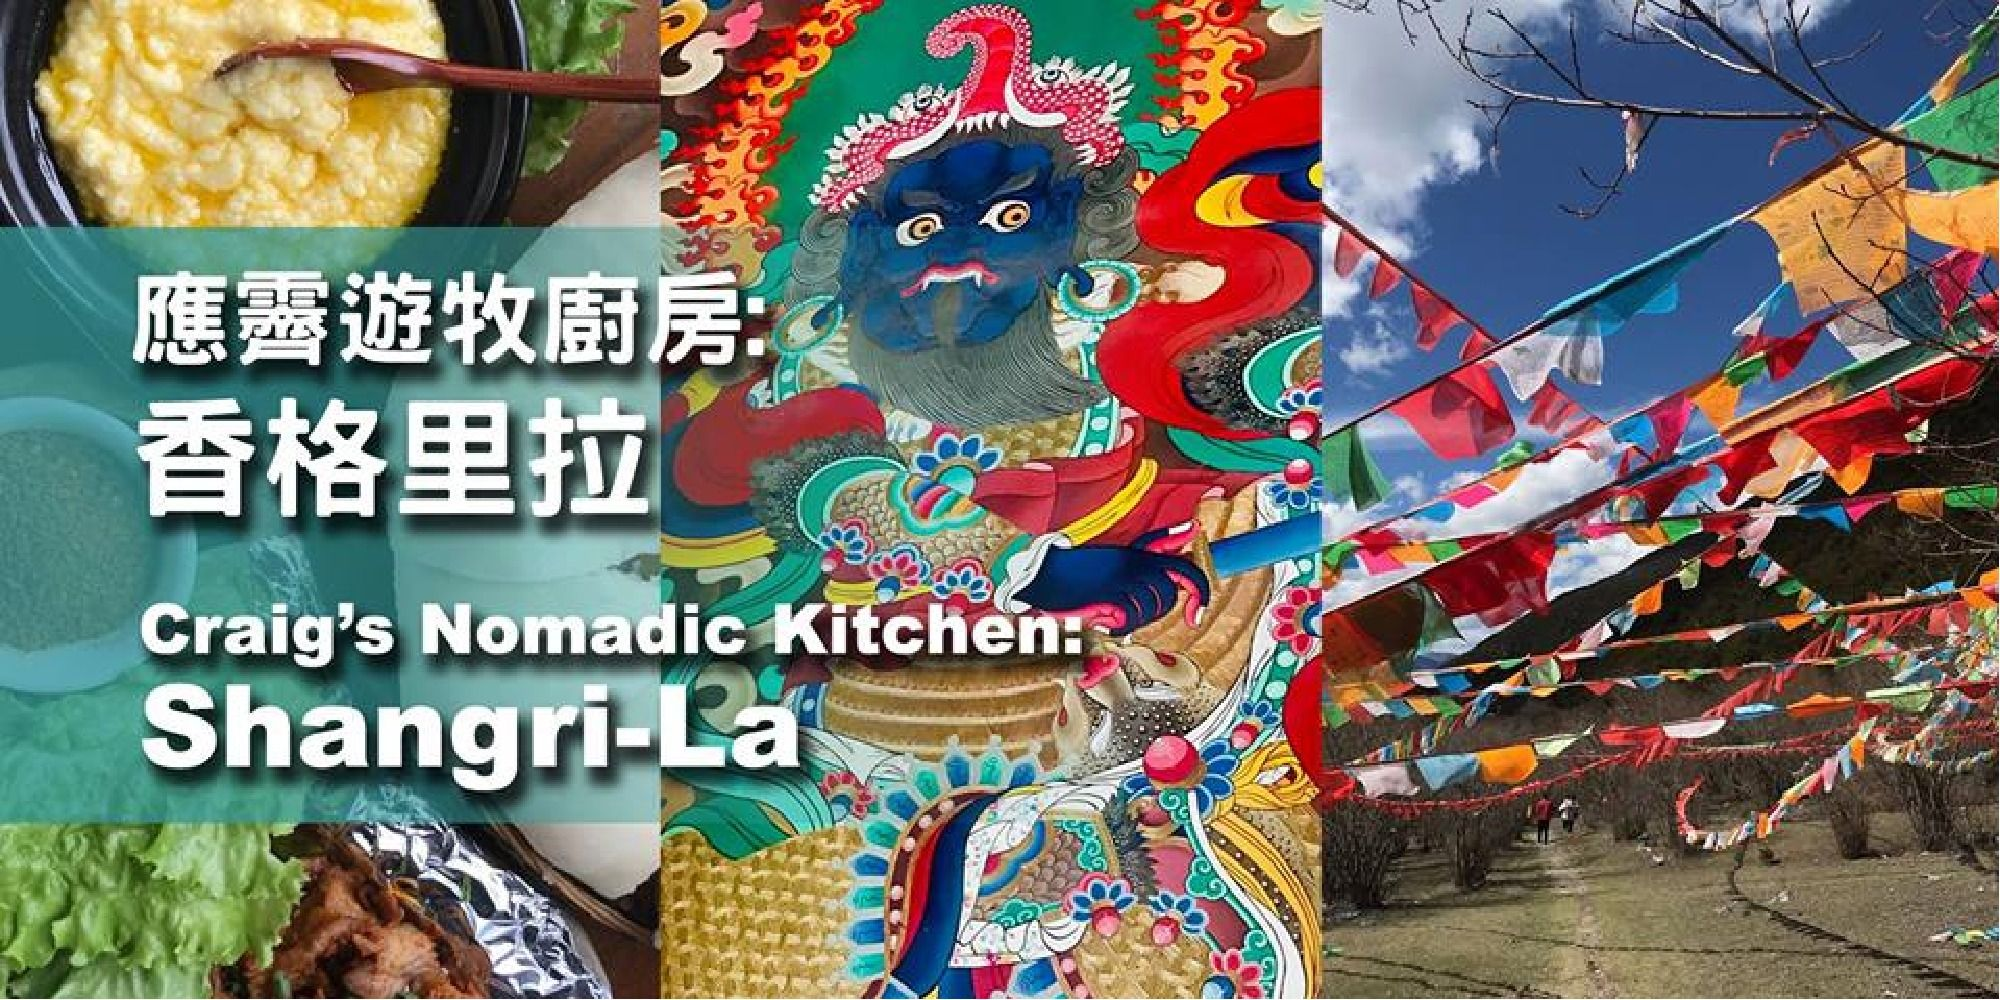 應霽遊牧廚房:香格里拉 (Craig's Nomadic Kitchen: Shangri-La)